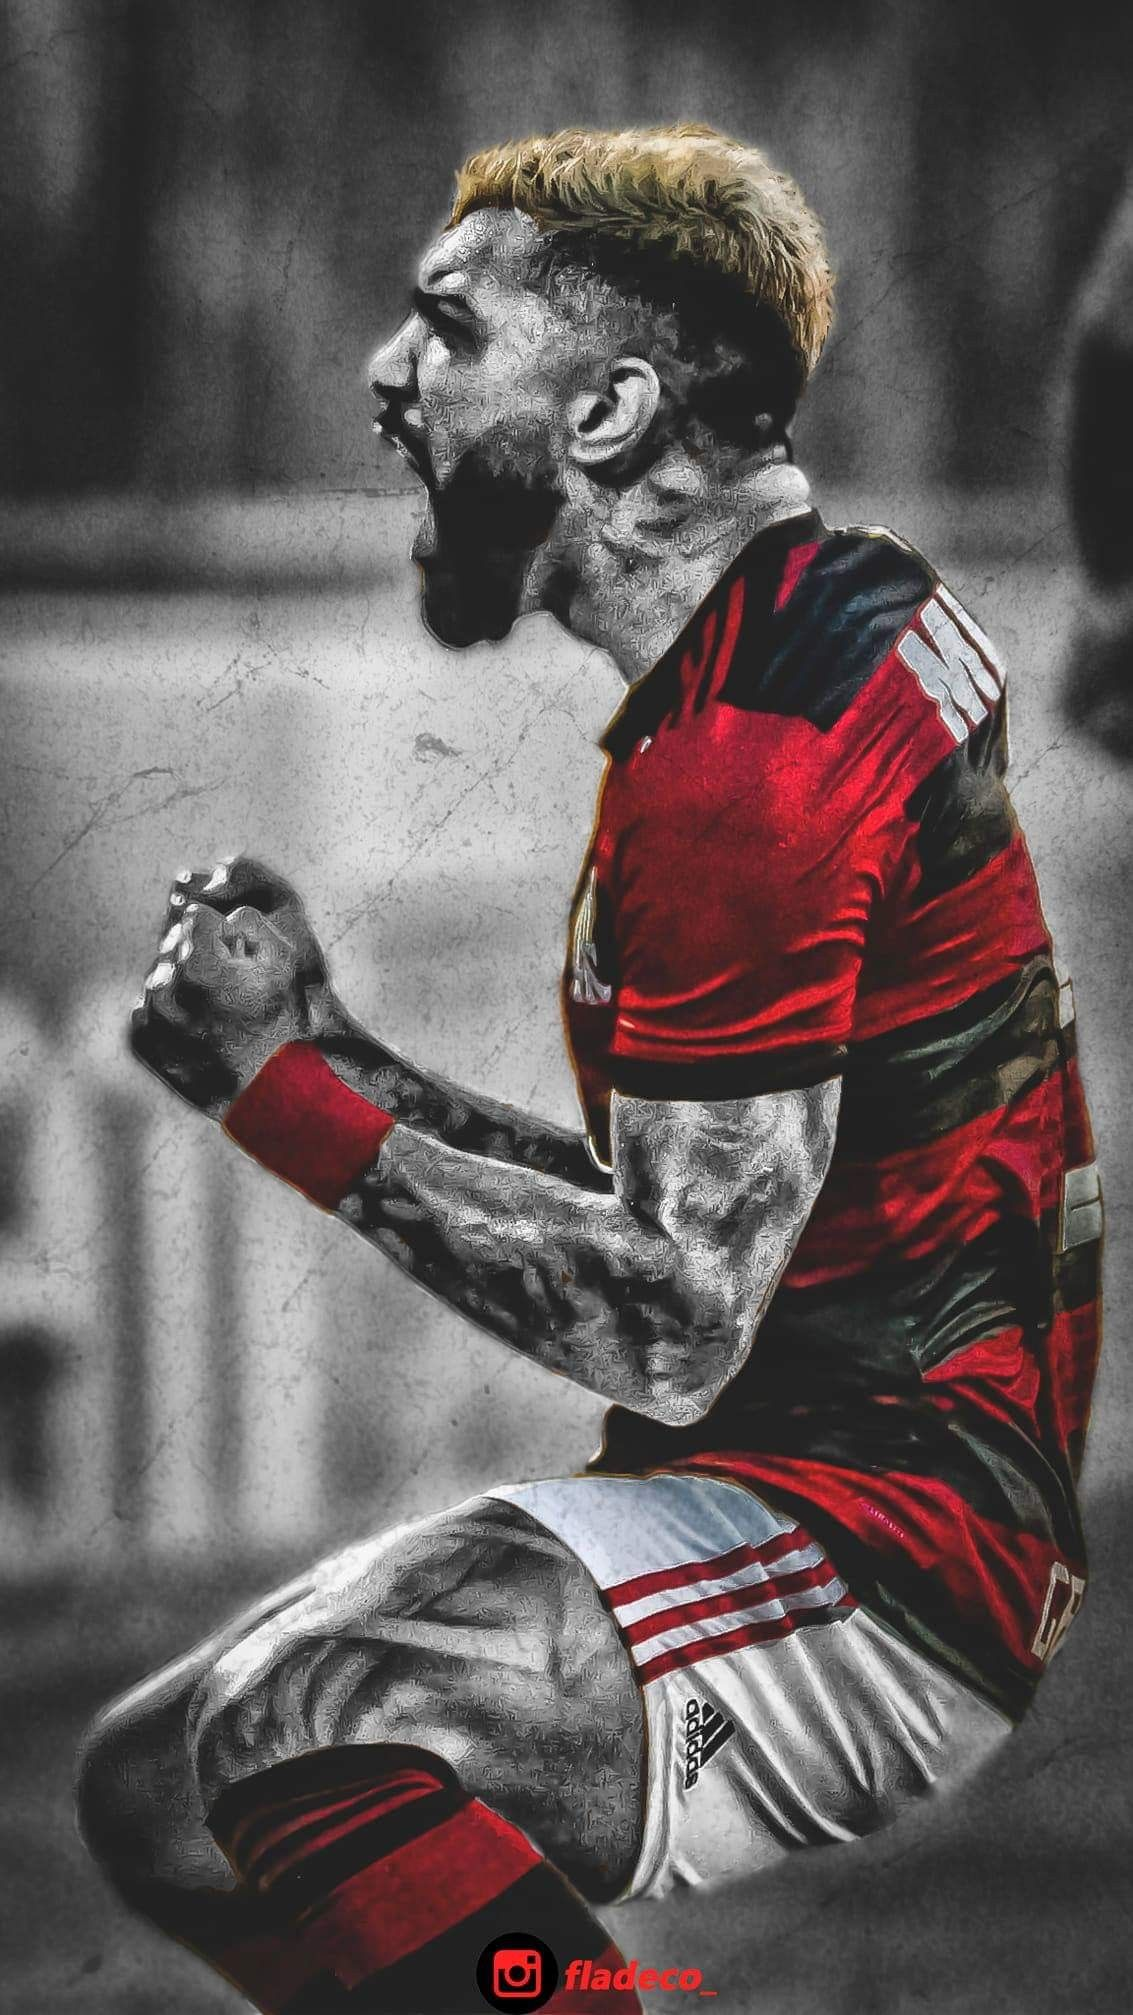 Gabigol Na Raça Flamengo Fladeco Flamengo Wallpaper